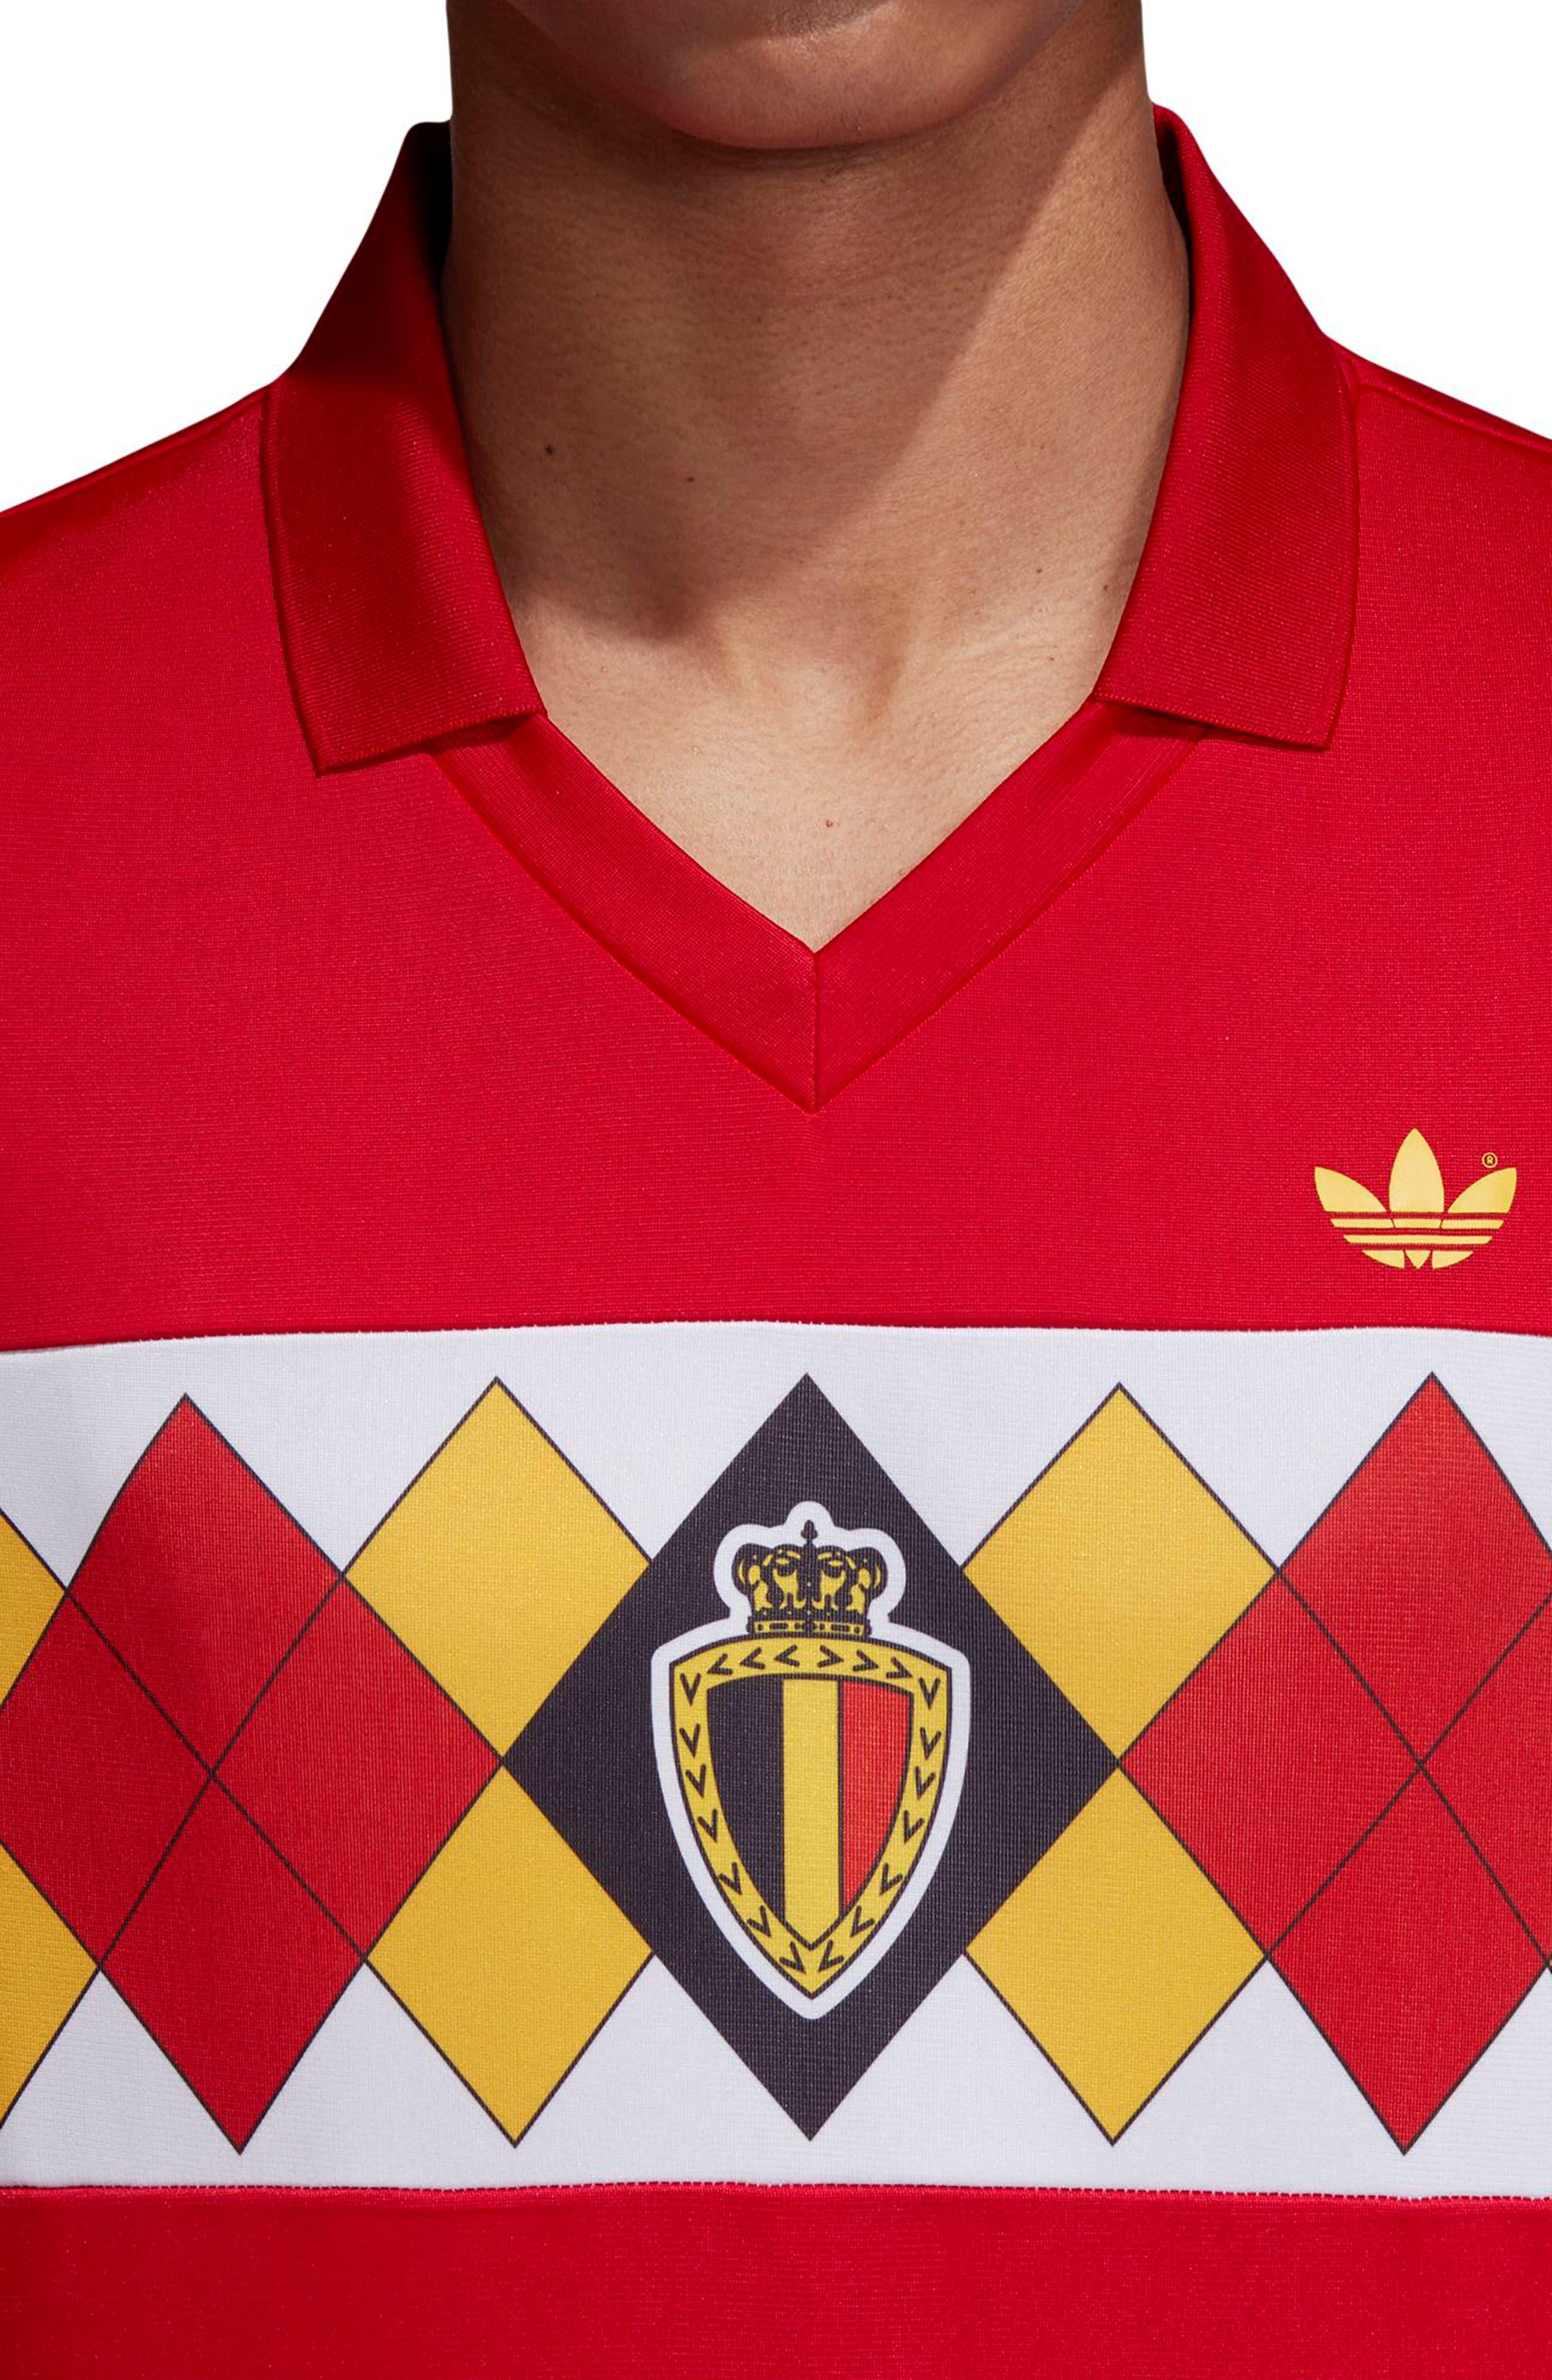 adidas Original Belgium 1984 Soccer Jersey,                             Alternate thumbnail 4, color,                             Vicred